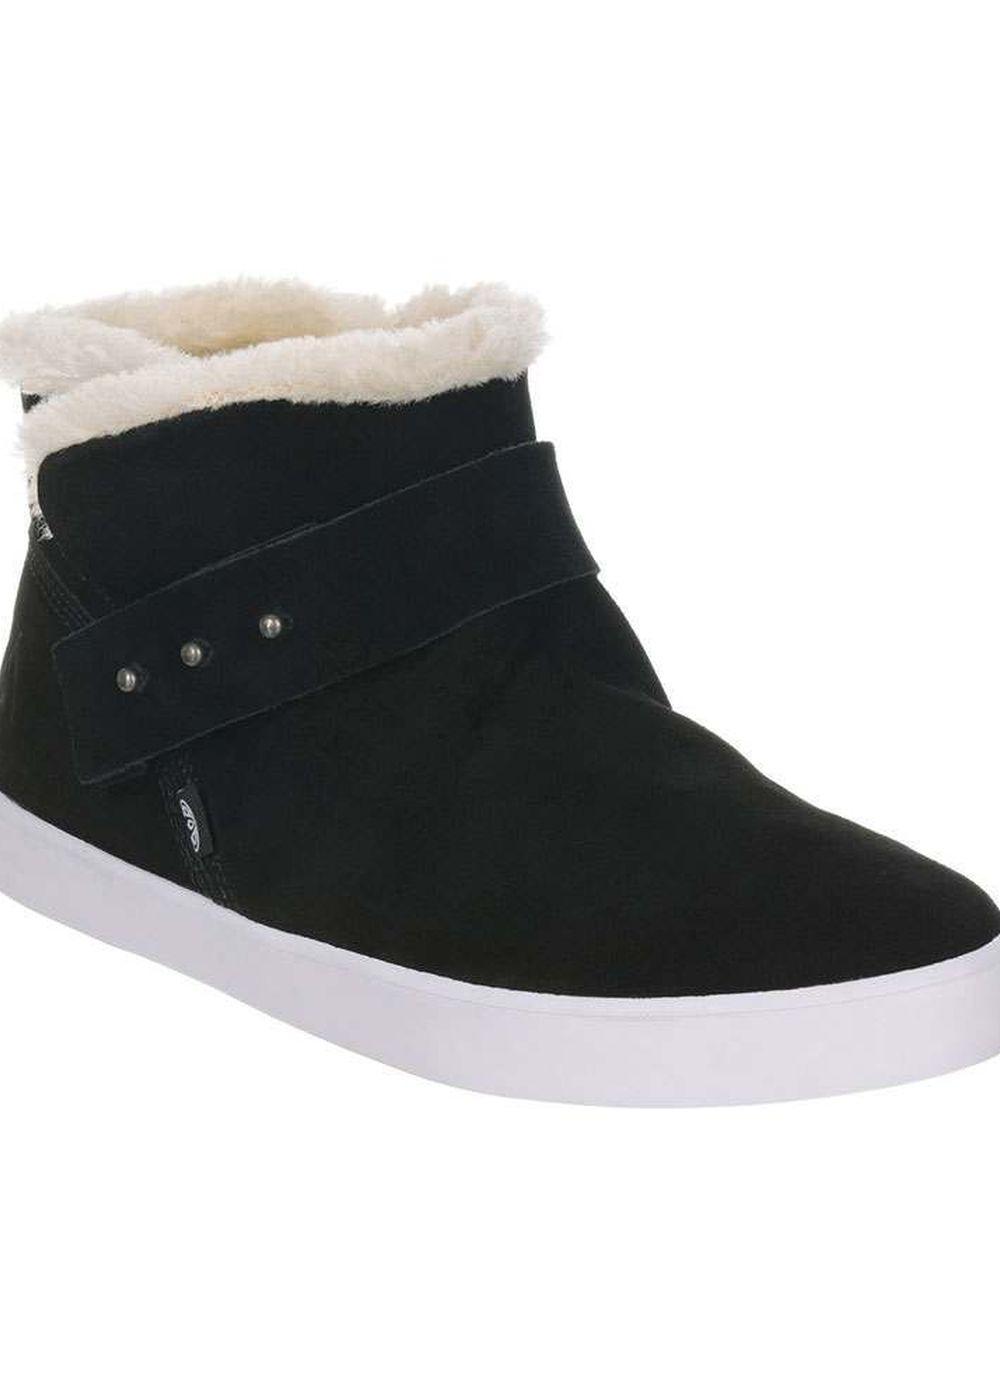 animal-nevada-boots-black